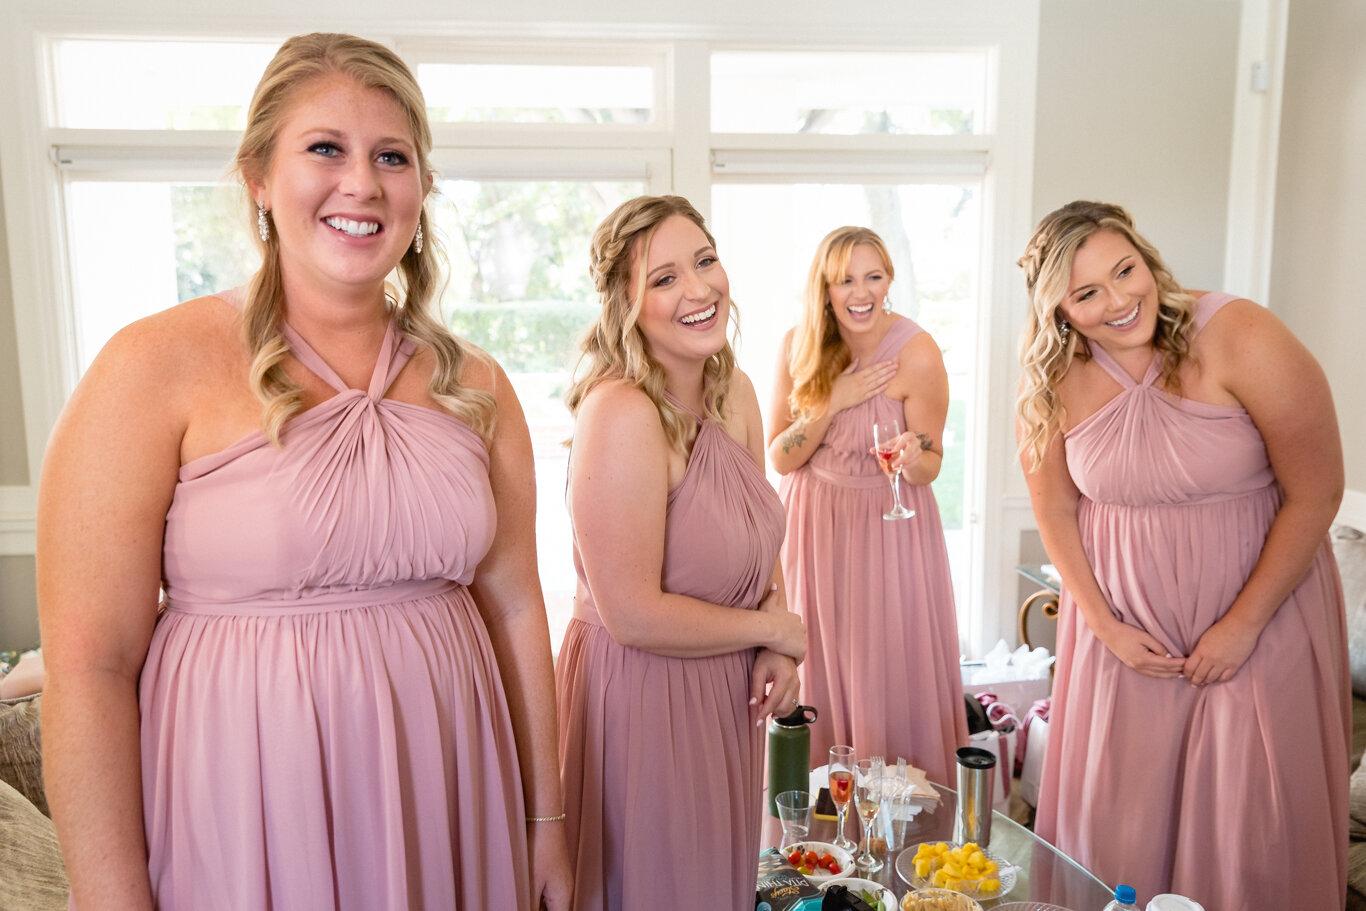 2019.08.24_Emily-Ashir-Wedding-at-the-Maples-5022.jpg